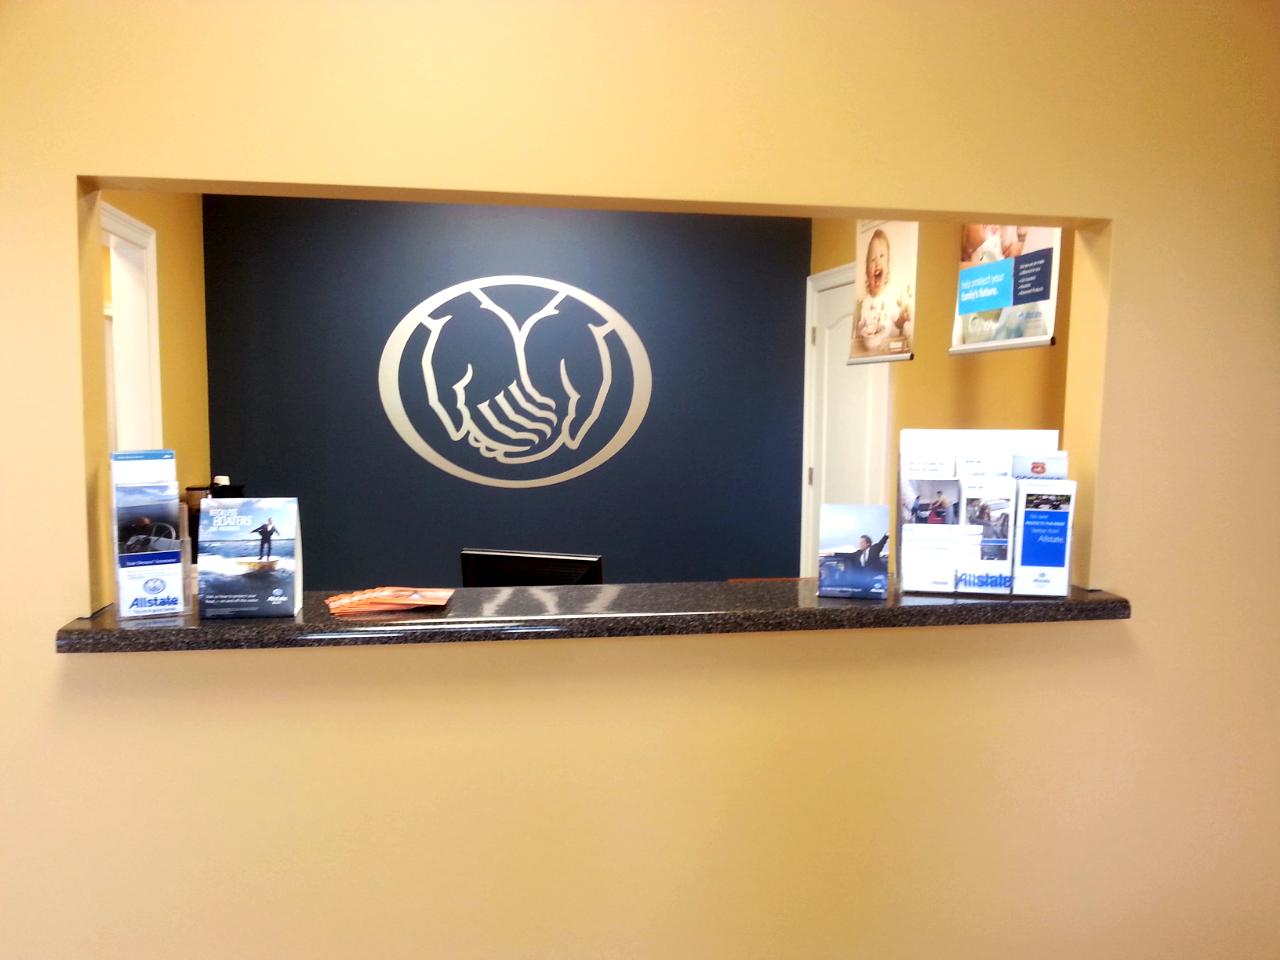 Betsy McArn: Allstate Insurance image 1